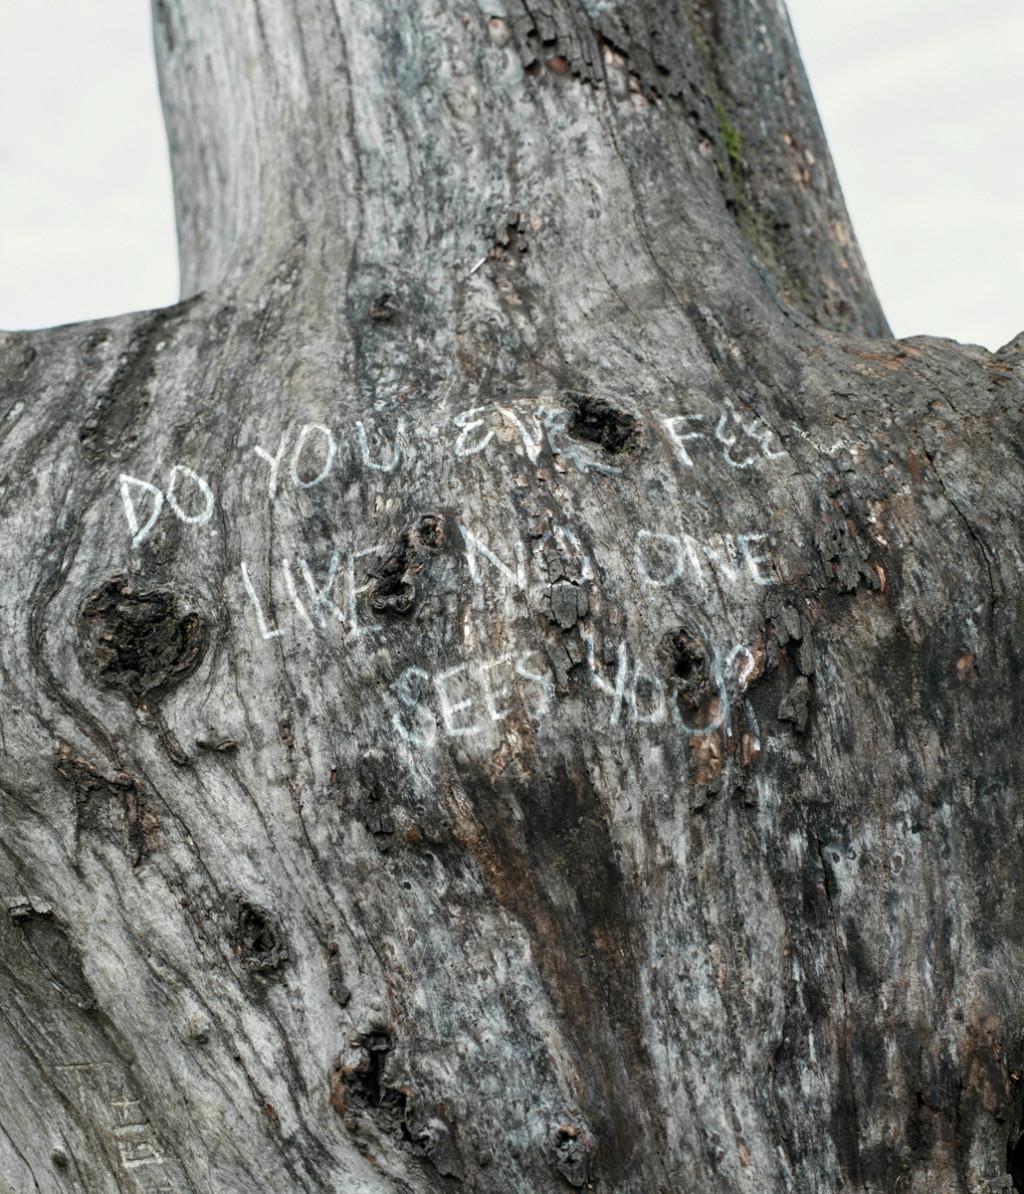 DIVERSIONS RICARDO NAGAOKA